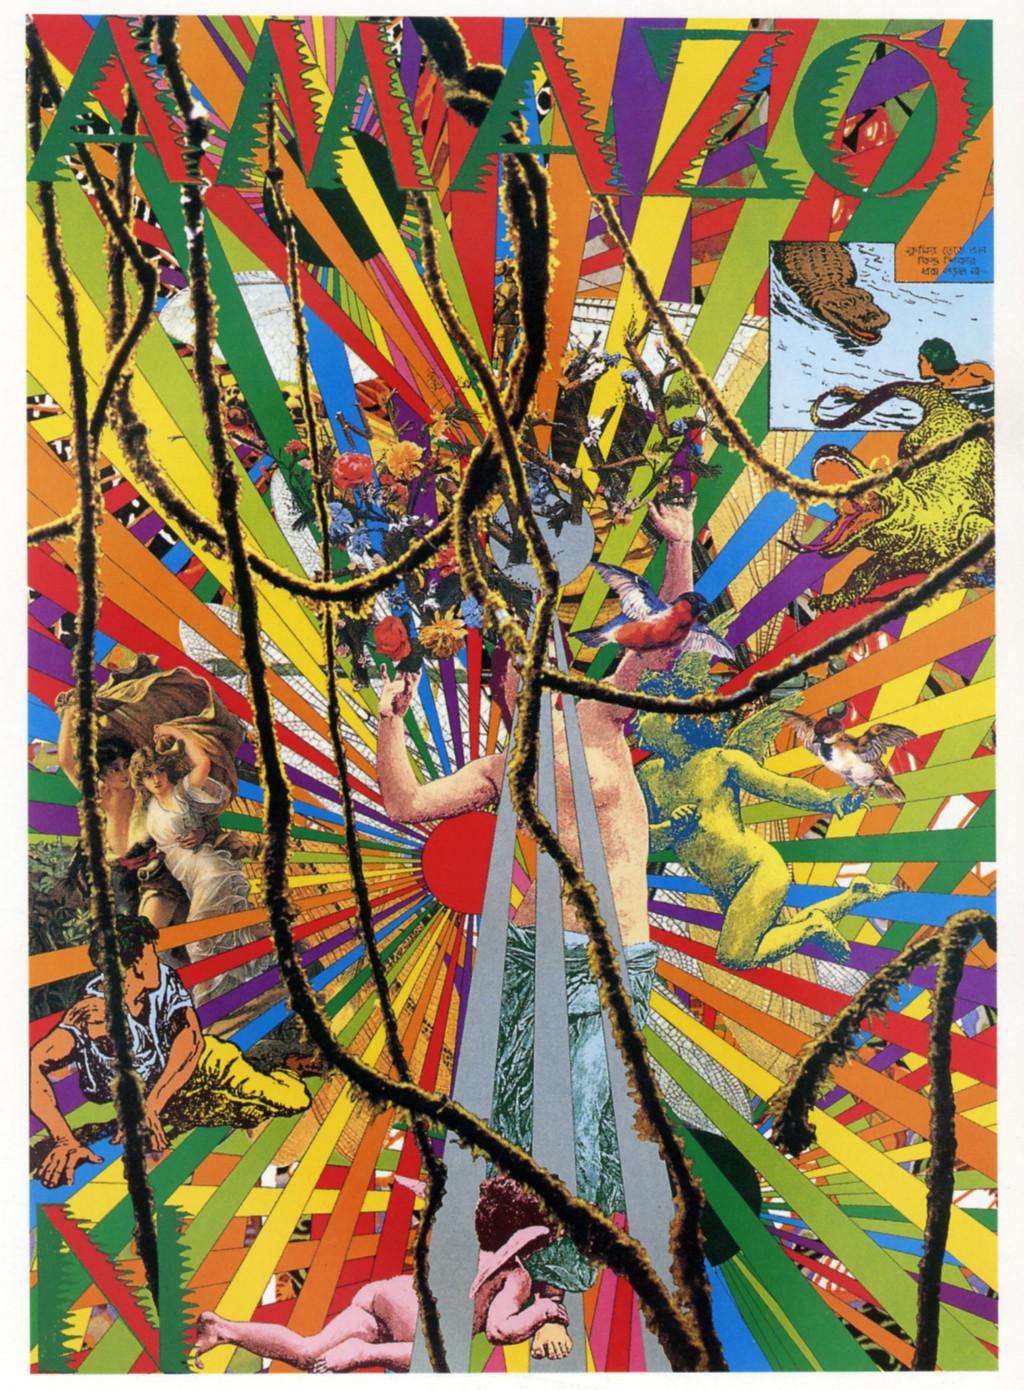 Tadanori Yokoo, 'Amazo', 1989. Collectie Stedelijk Museum Amsterdam